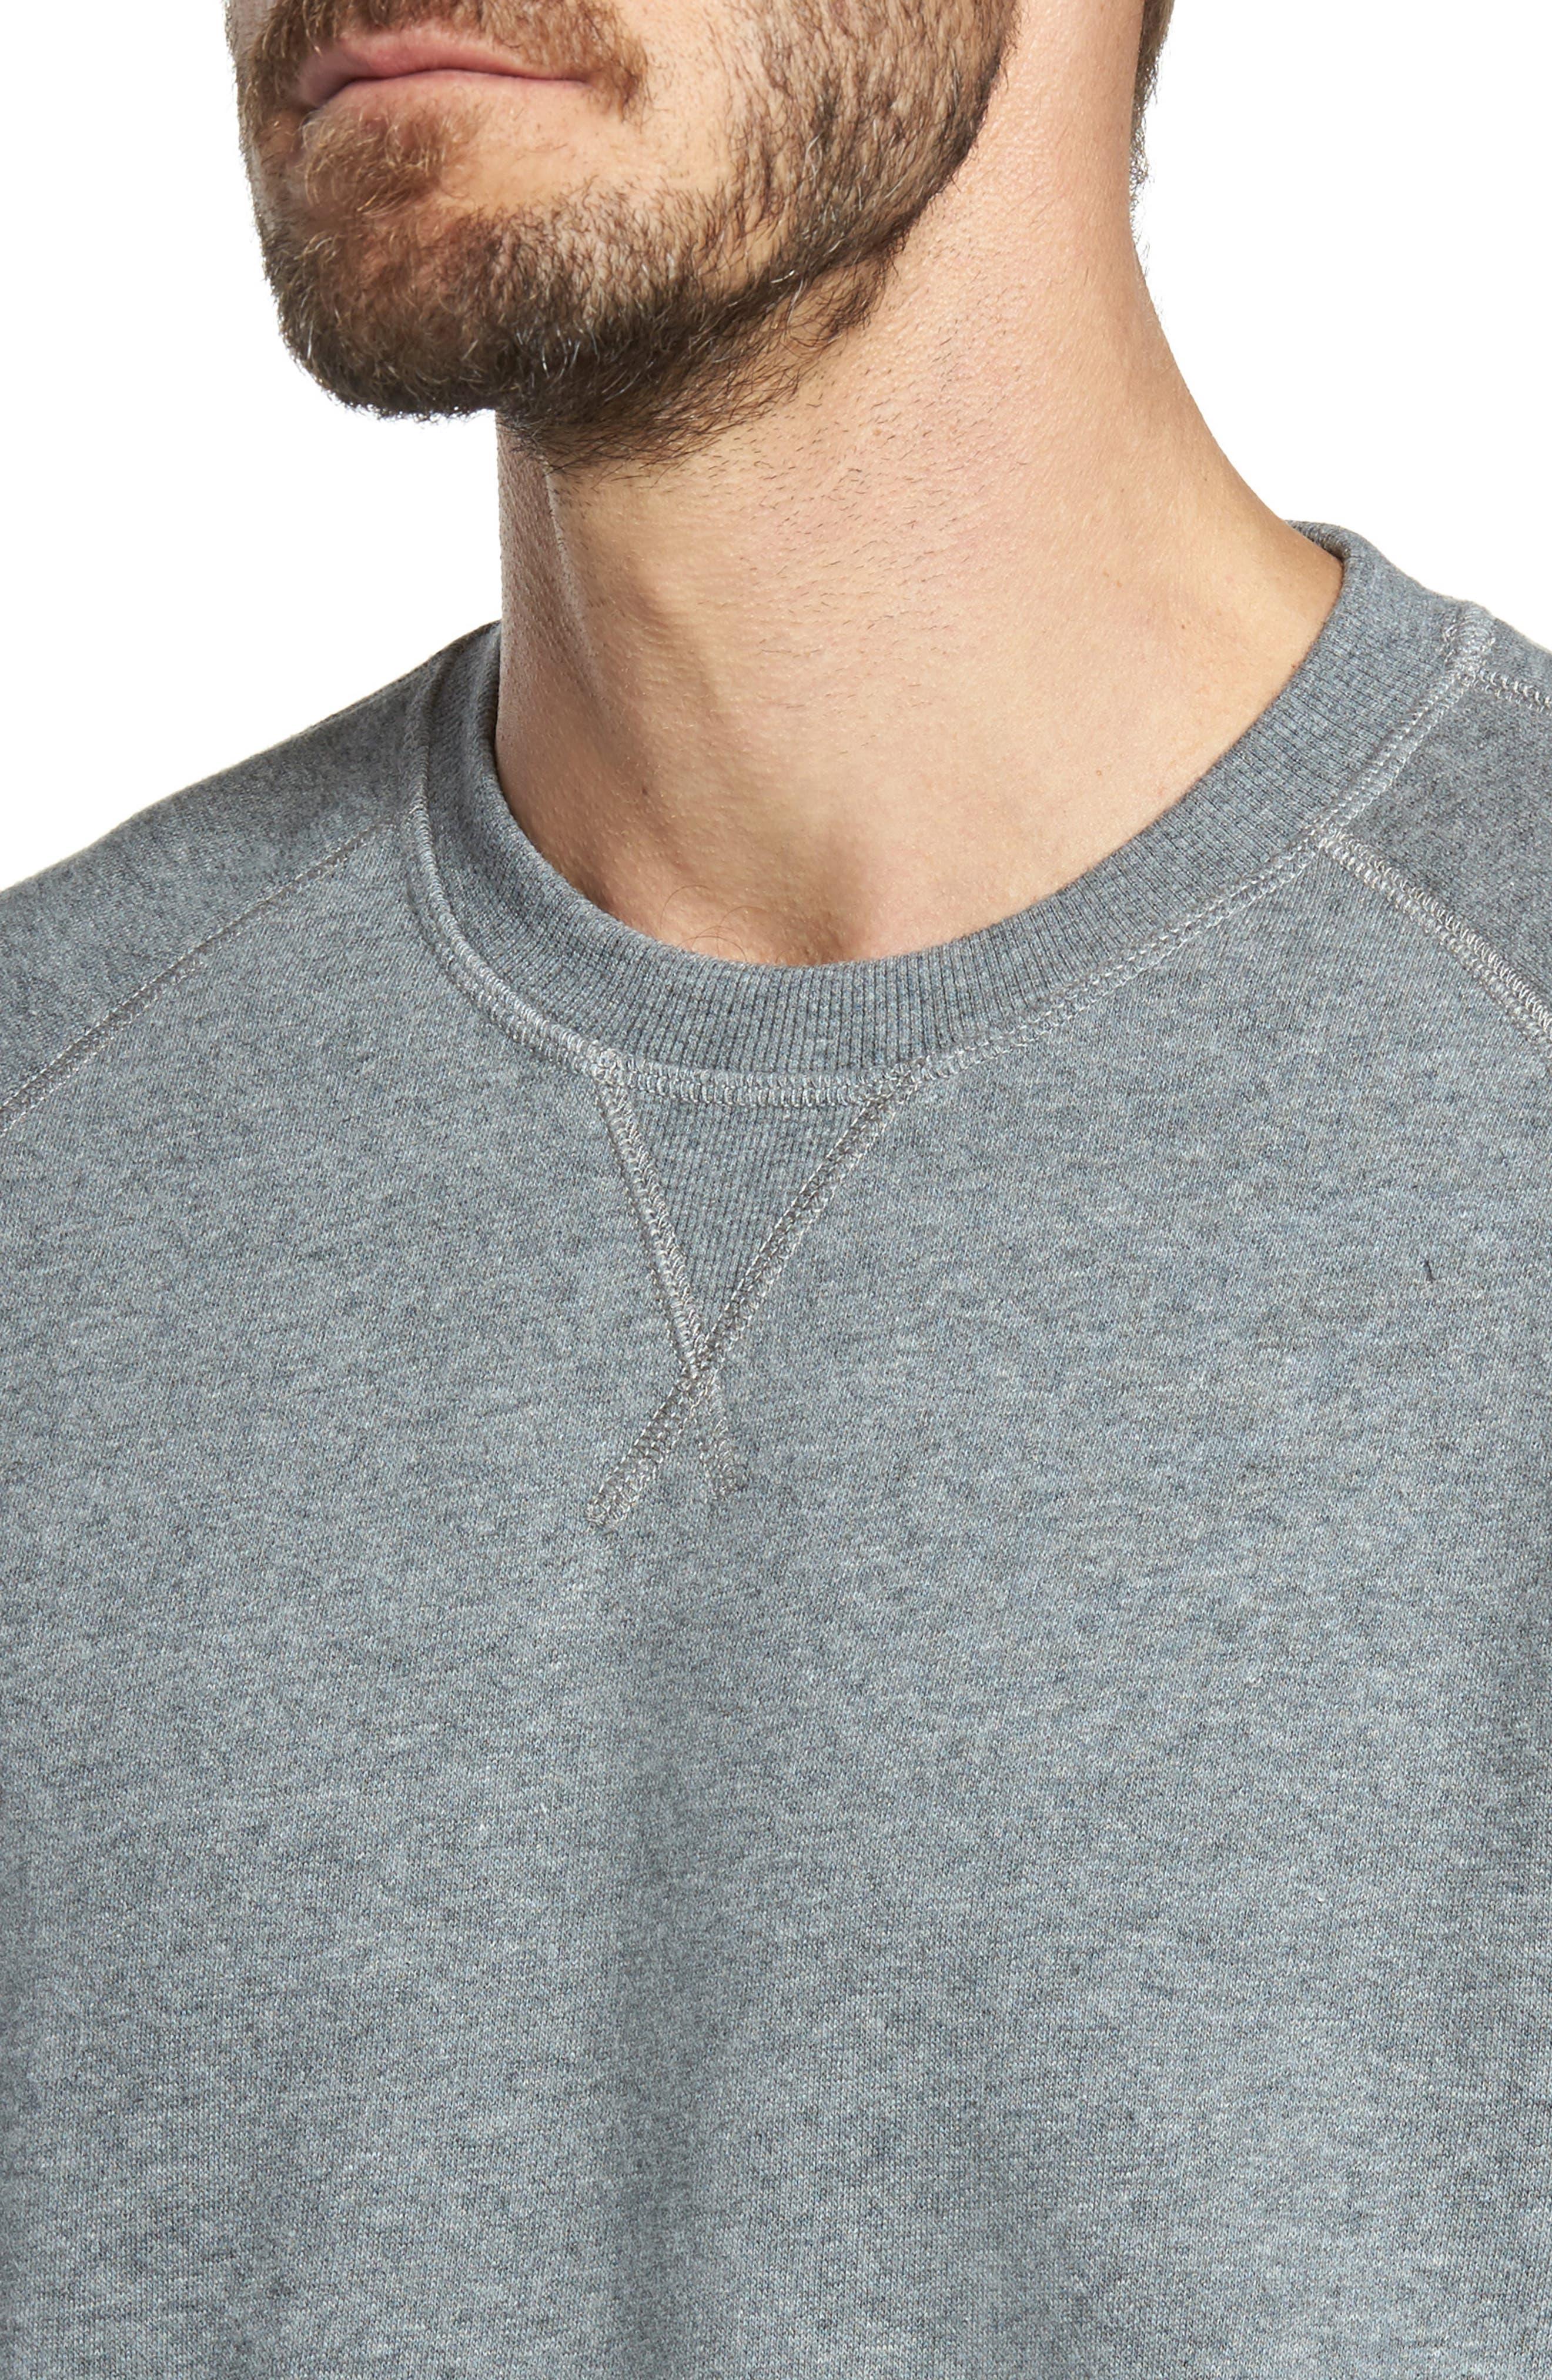 Fleece Sweatshirt,                             Alternate thumbnail 4, color,                             Grey Paloma Heather